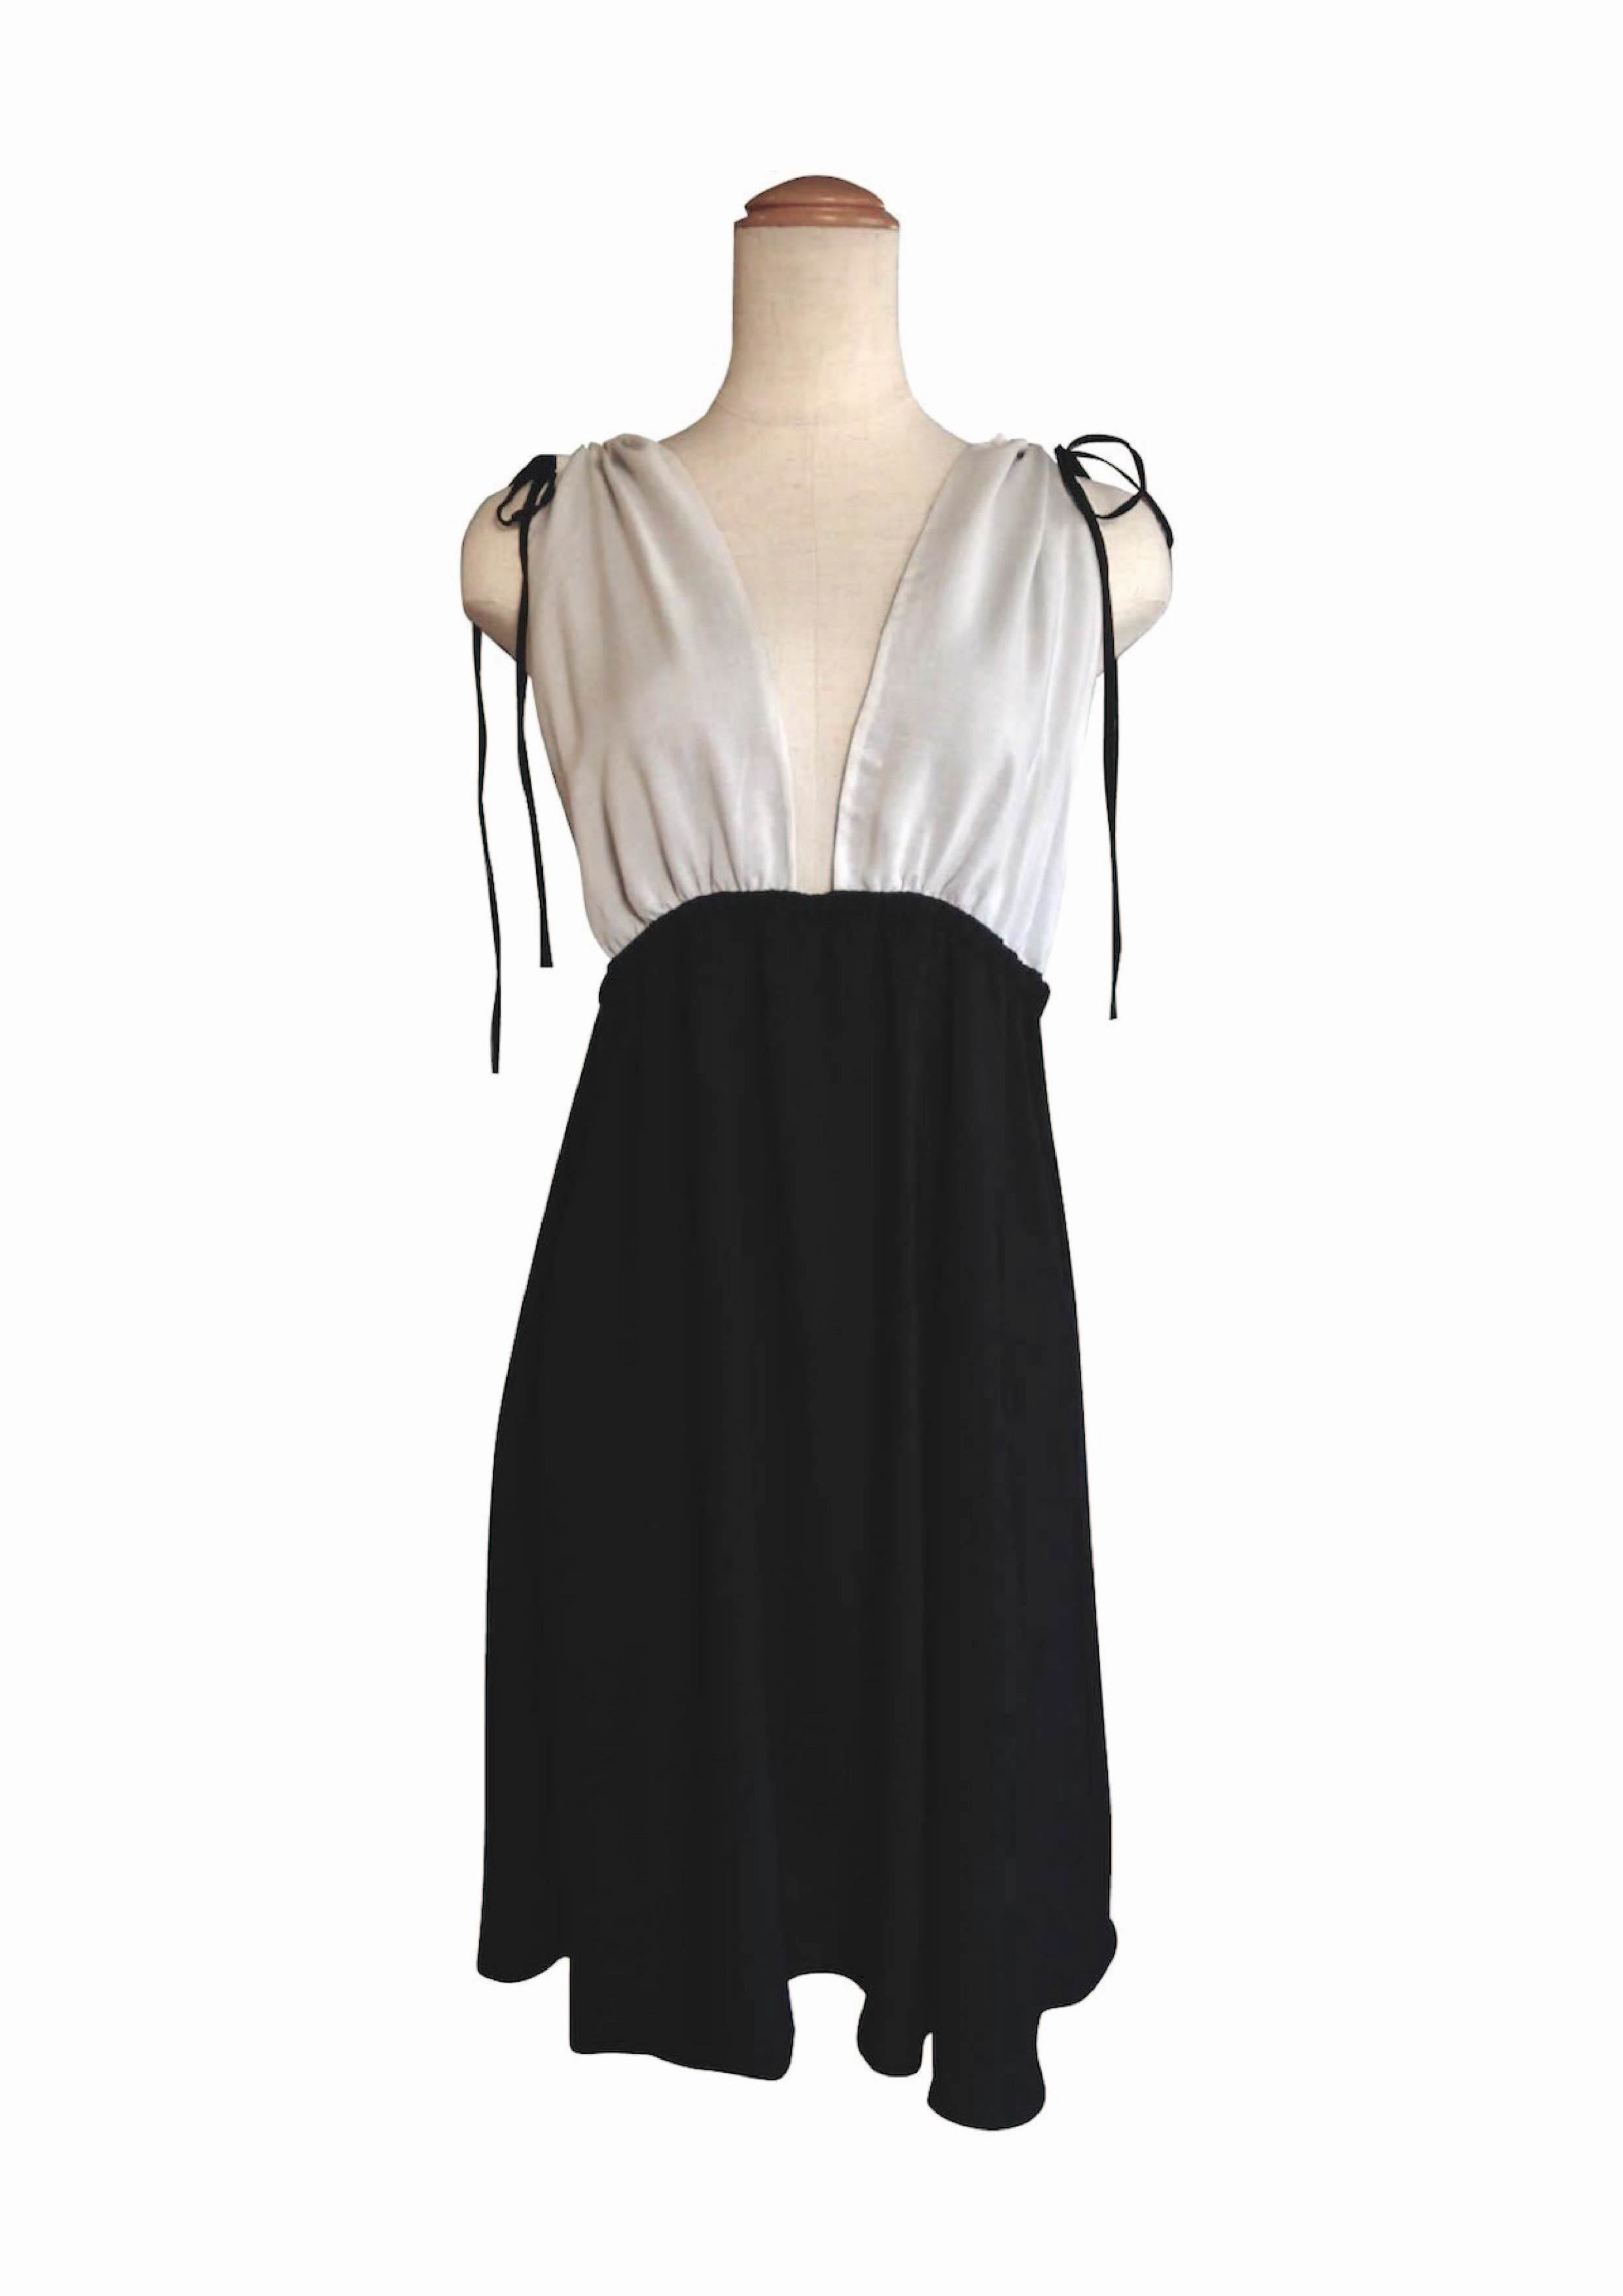 Negliger Night wear Black&White ネグリジェナイトウェア ブラック&ホワイト